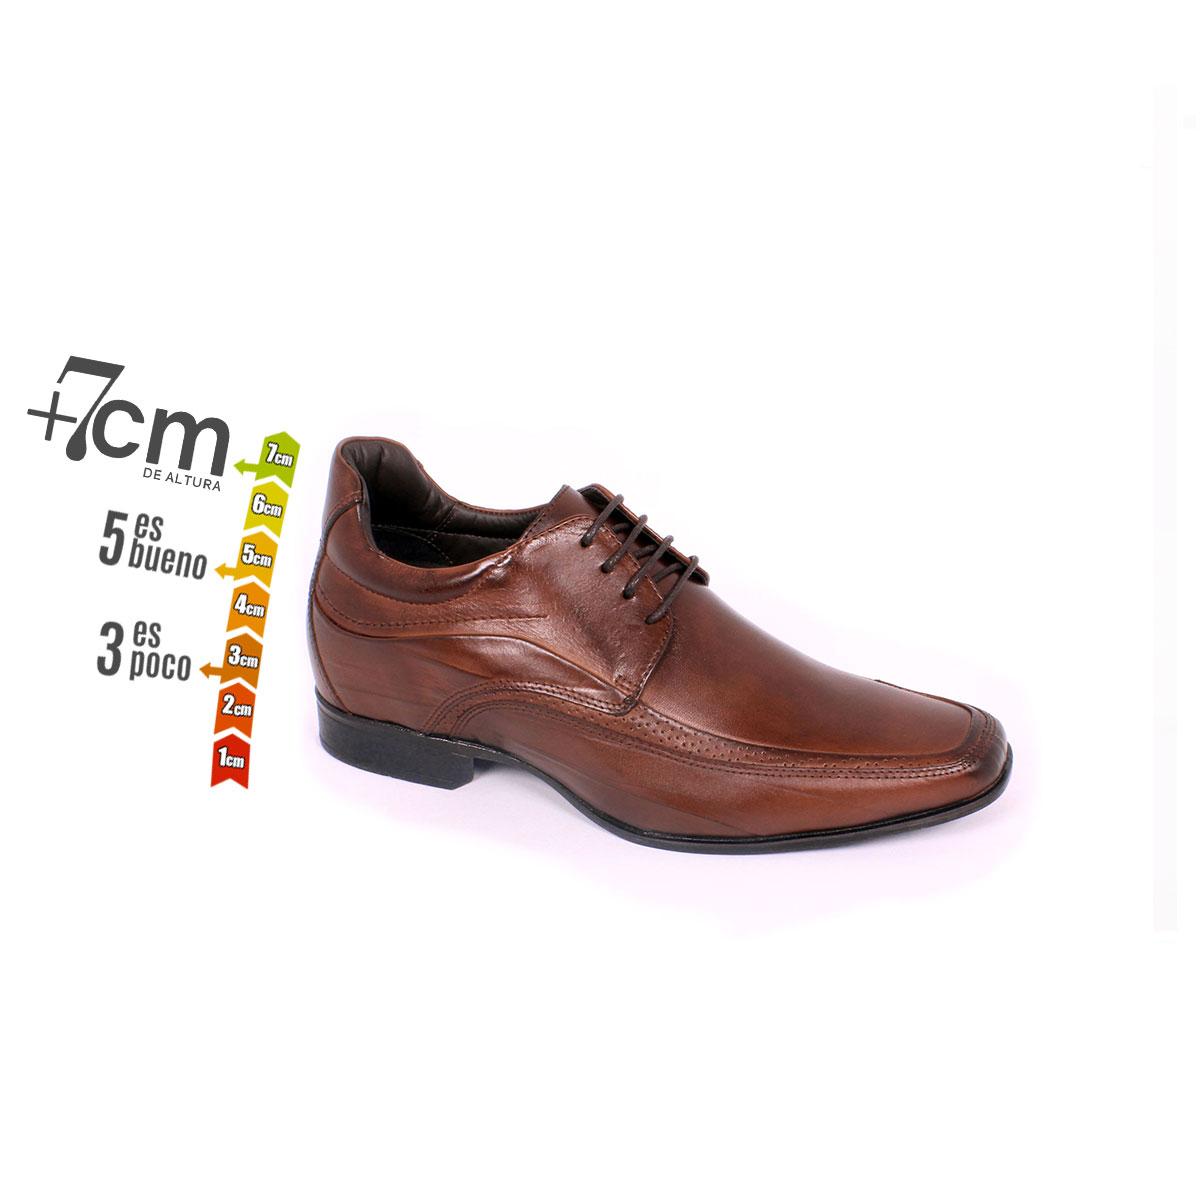 Zapato Formal Manager Café Max Denegri +7cm de Altura_74157